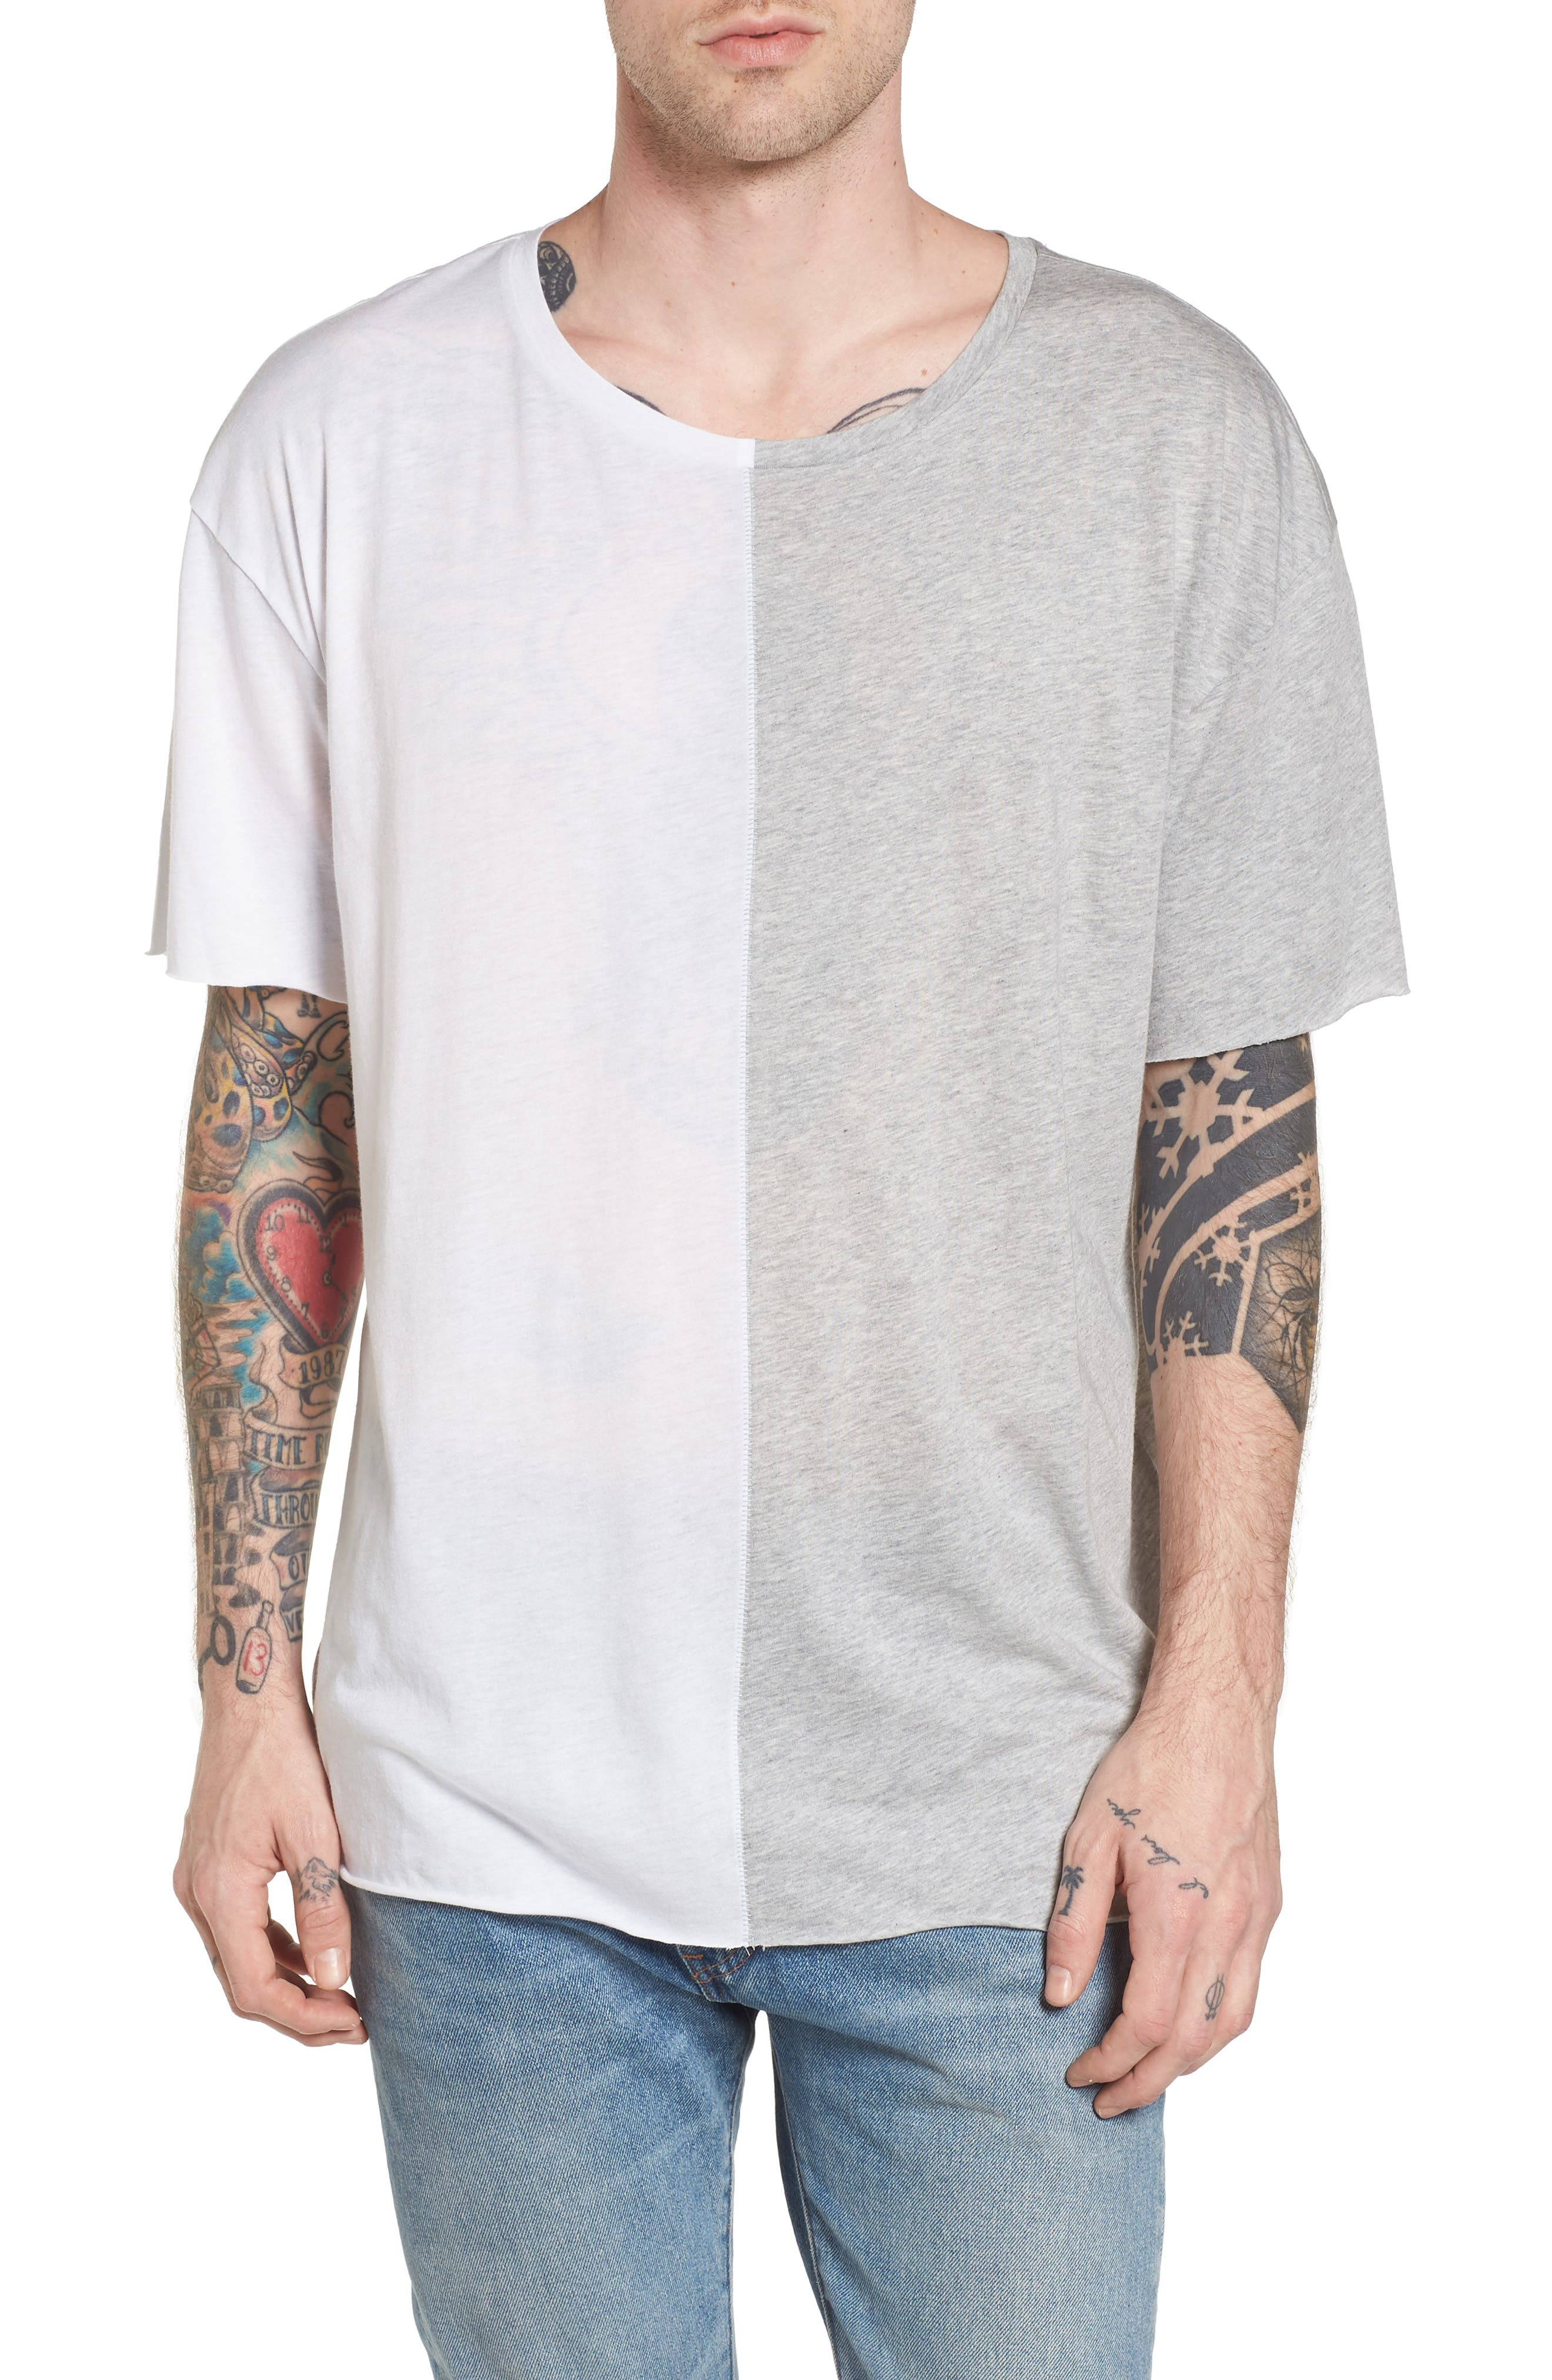 Boxy Splice T-Shirt,                             Main thumbnail 1, color,                             White/ Grey Heather